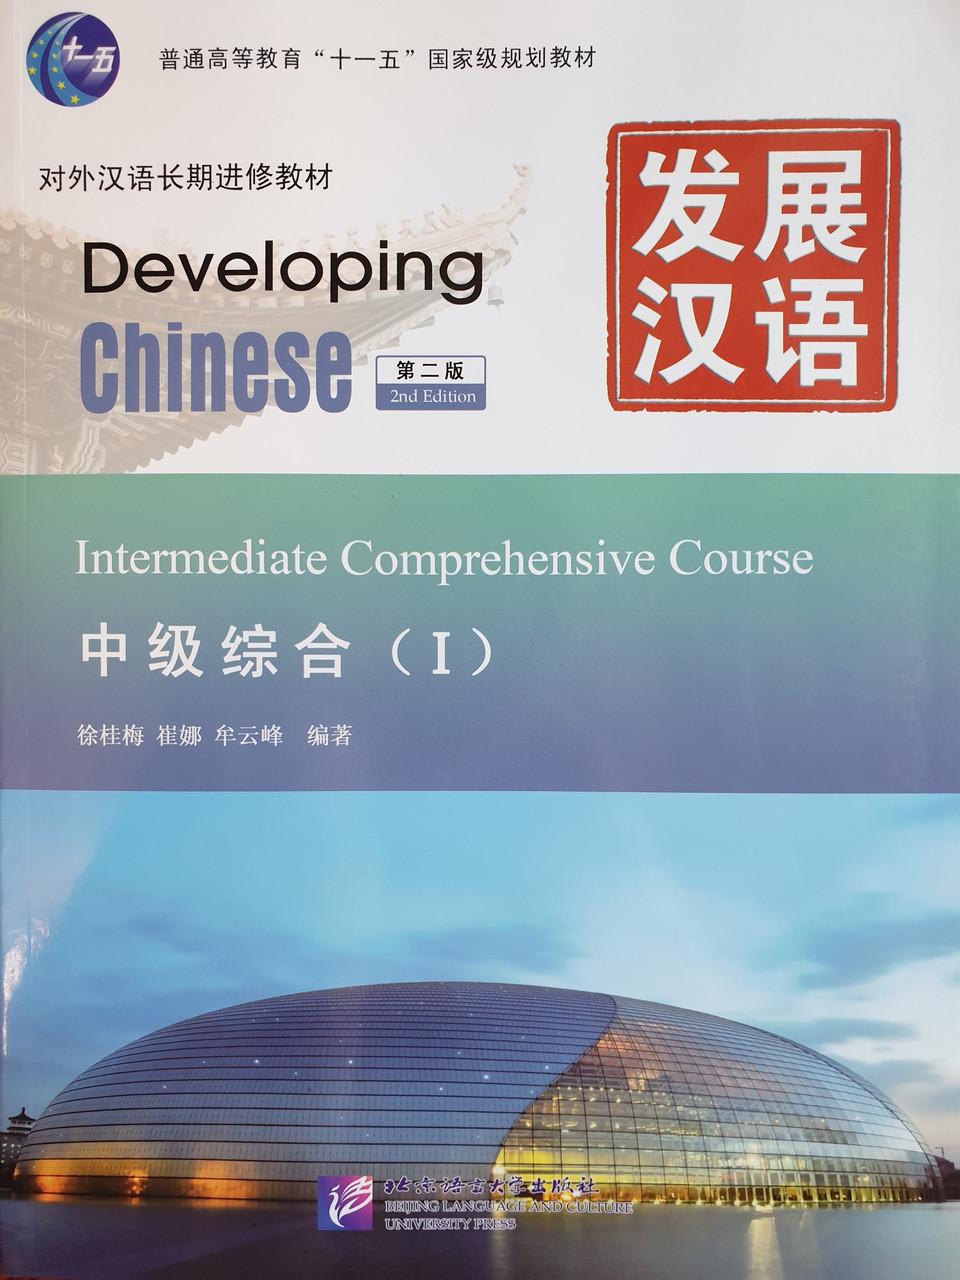 Developing Chinese. Общий курс. Средний уровень. Часть 1